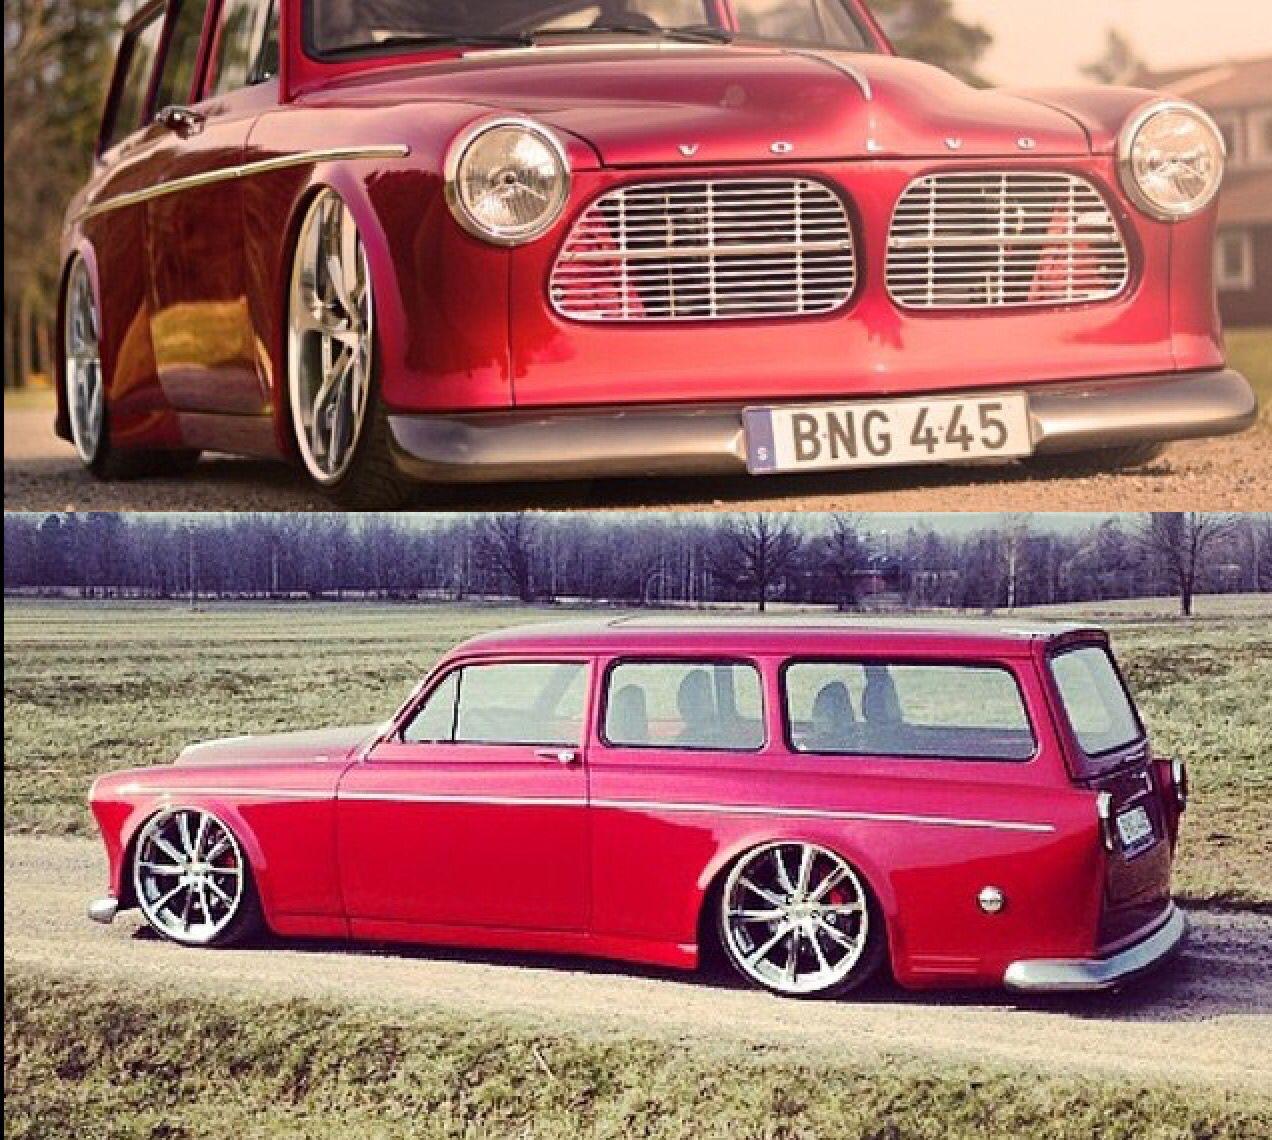 Volvo Wagon, Volvo, Vehicles